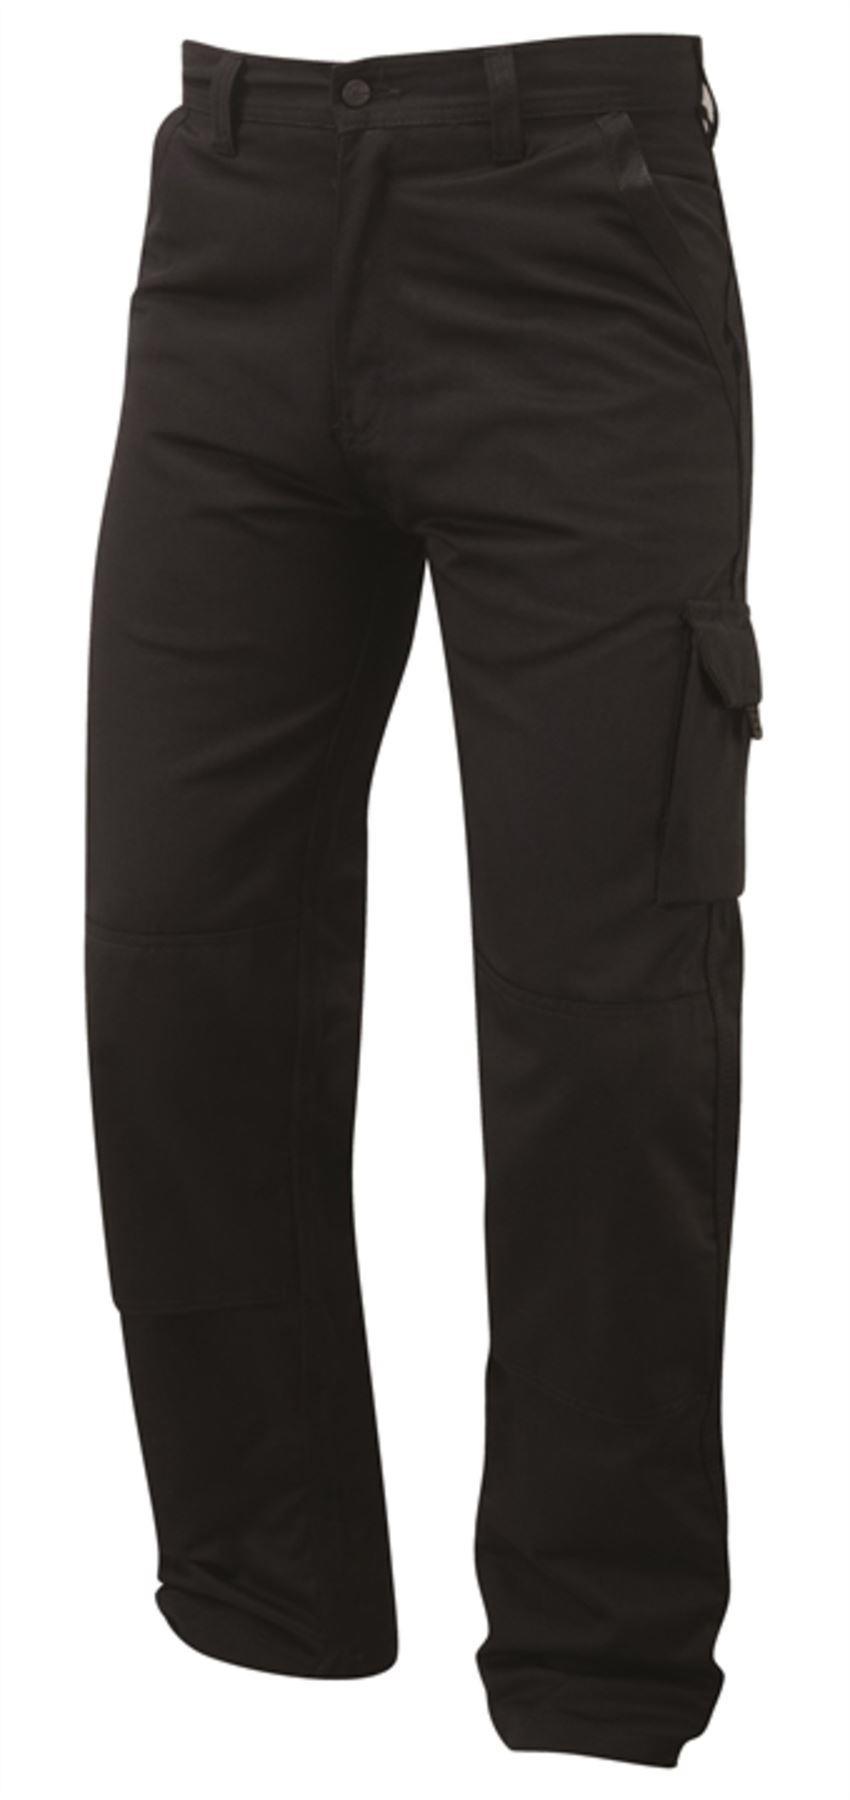 Orn Heron Kneepad Combat Trousers - Black|52W35L